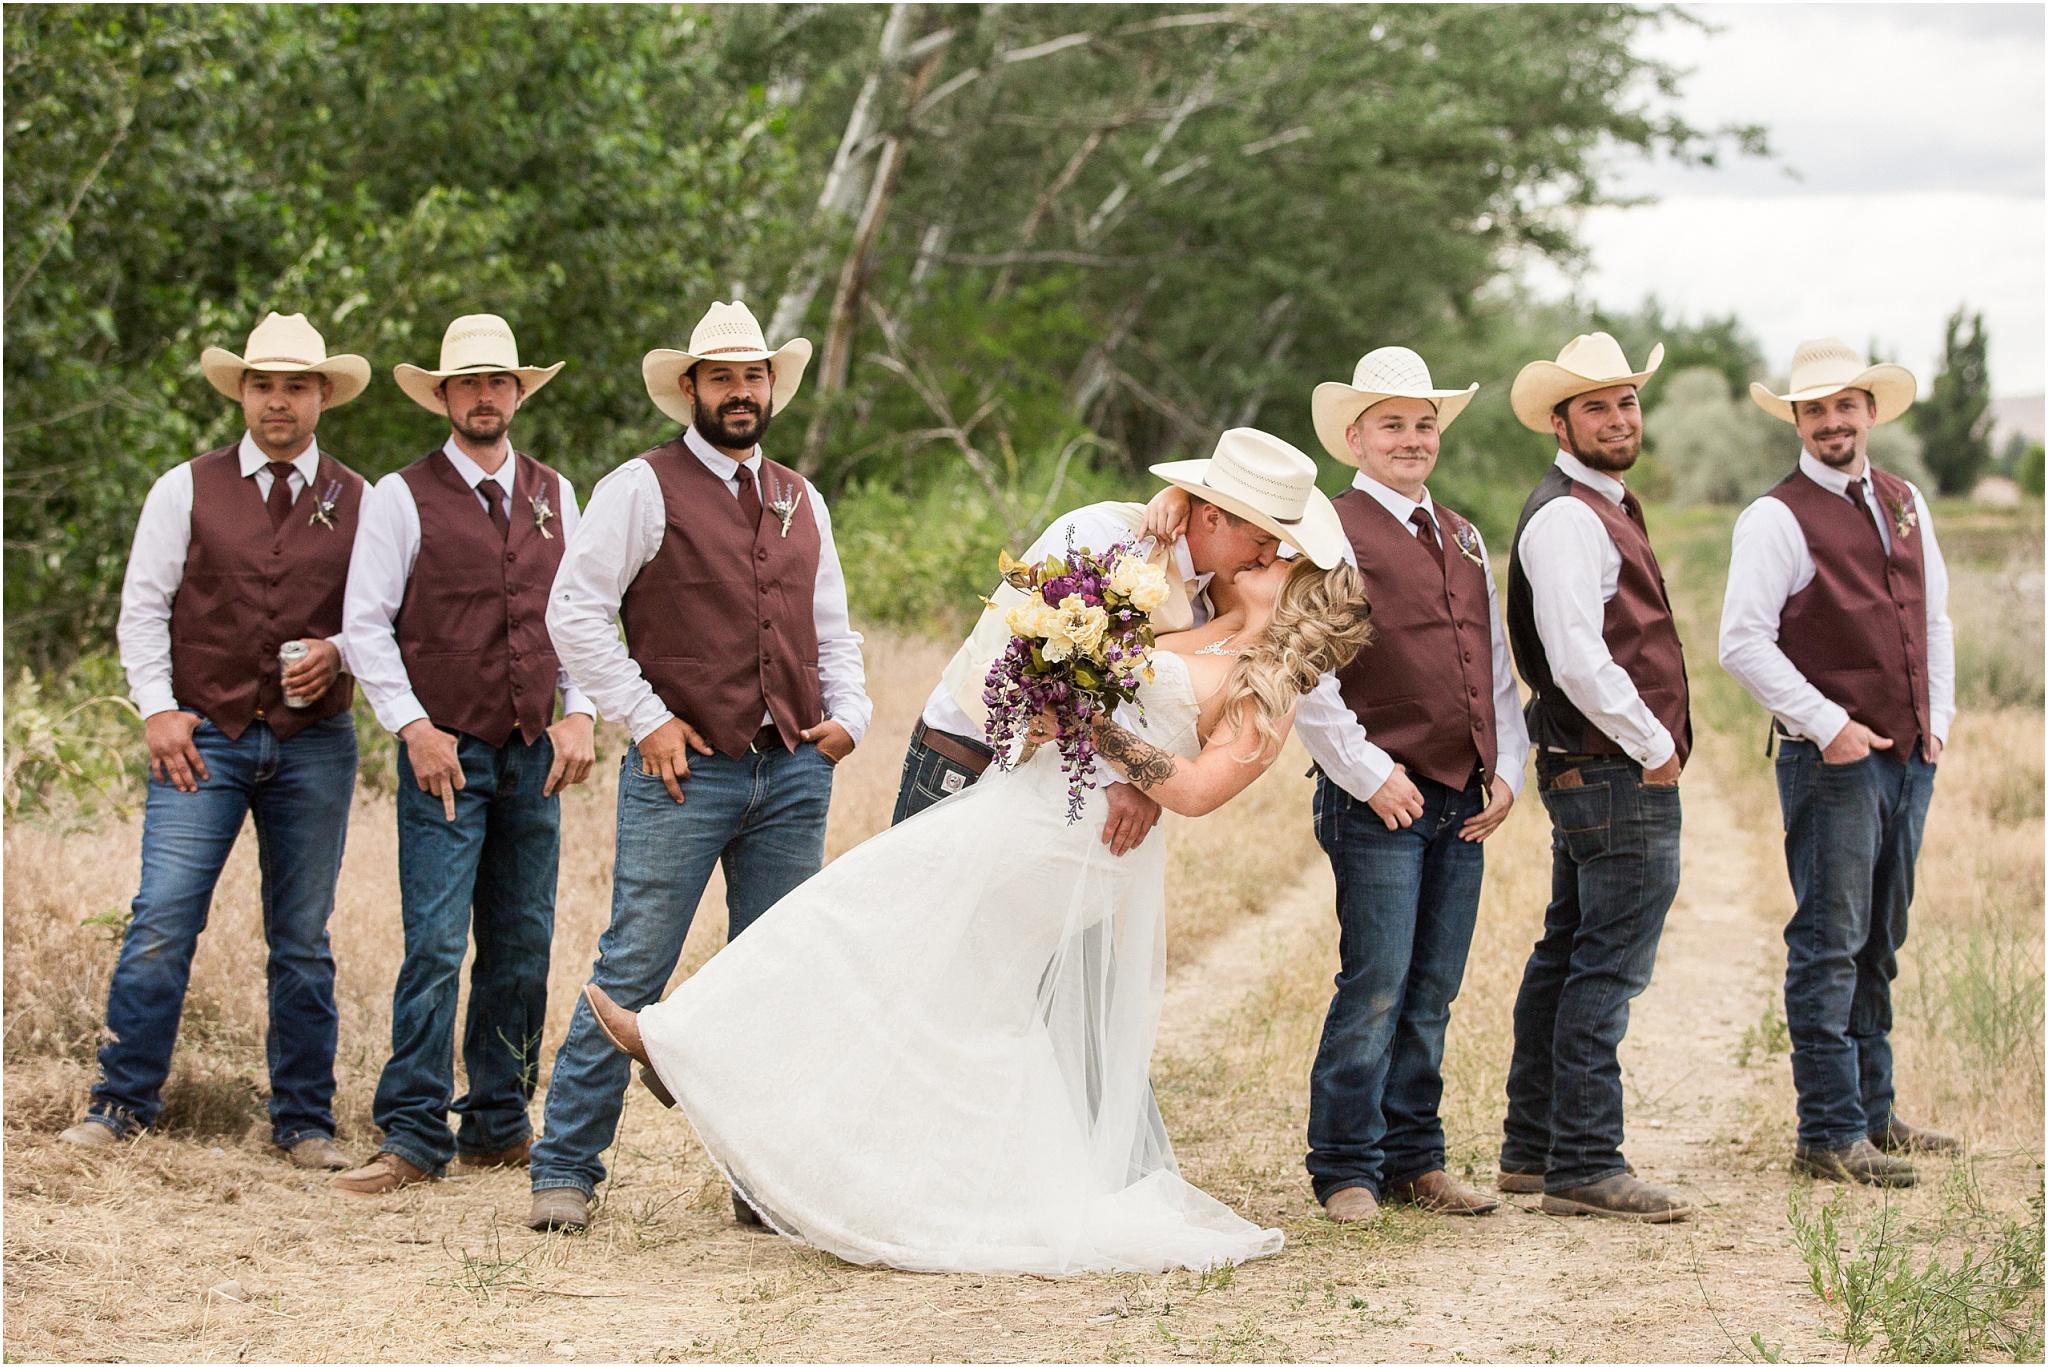 Wedding Photography_Emmett Idaho_Boise Idaho_Leah Southwick Photography_0056.jpg